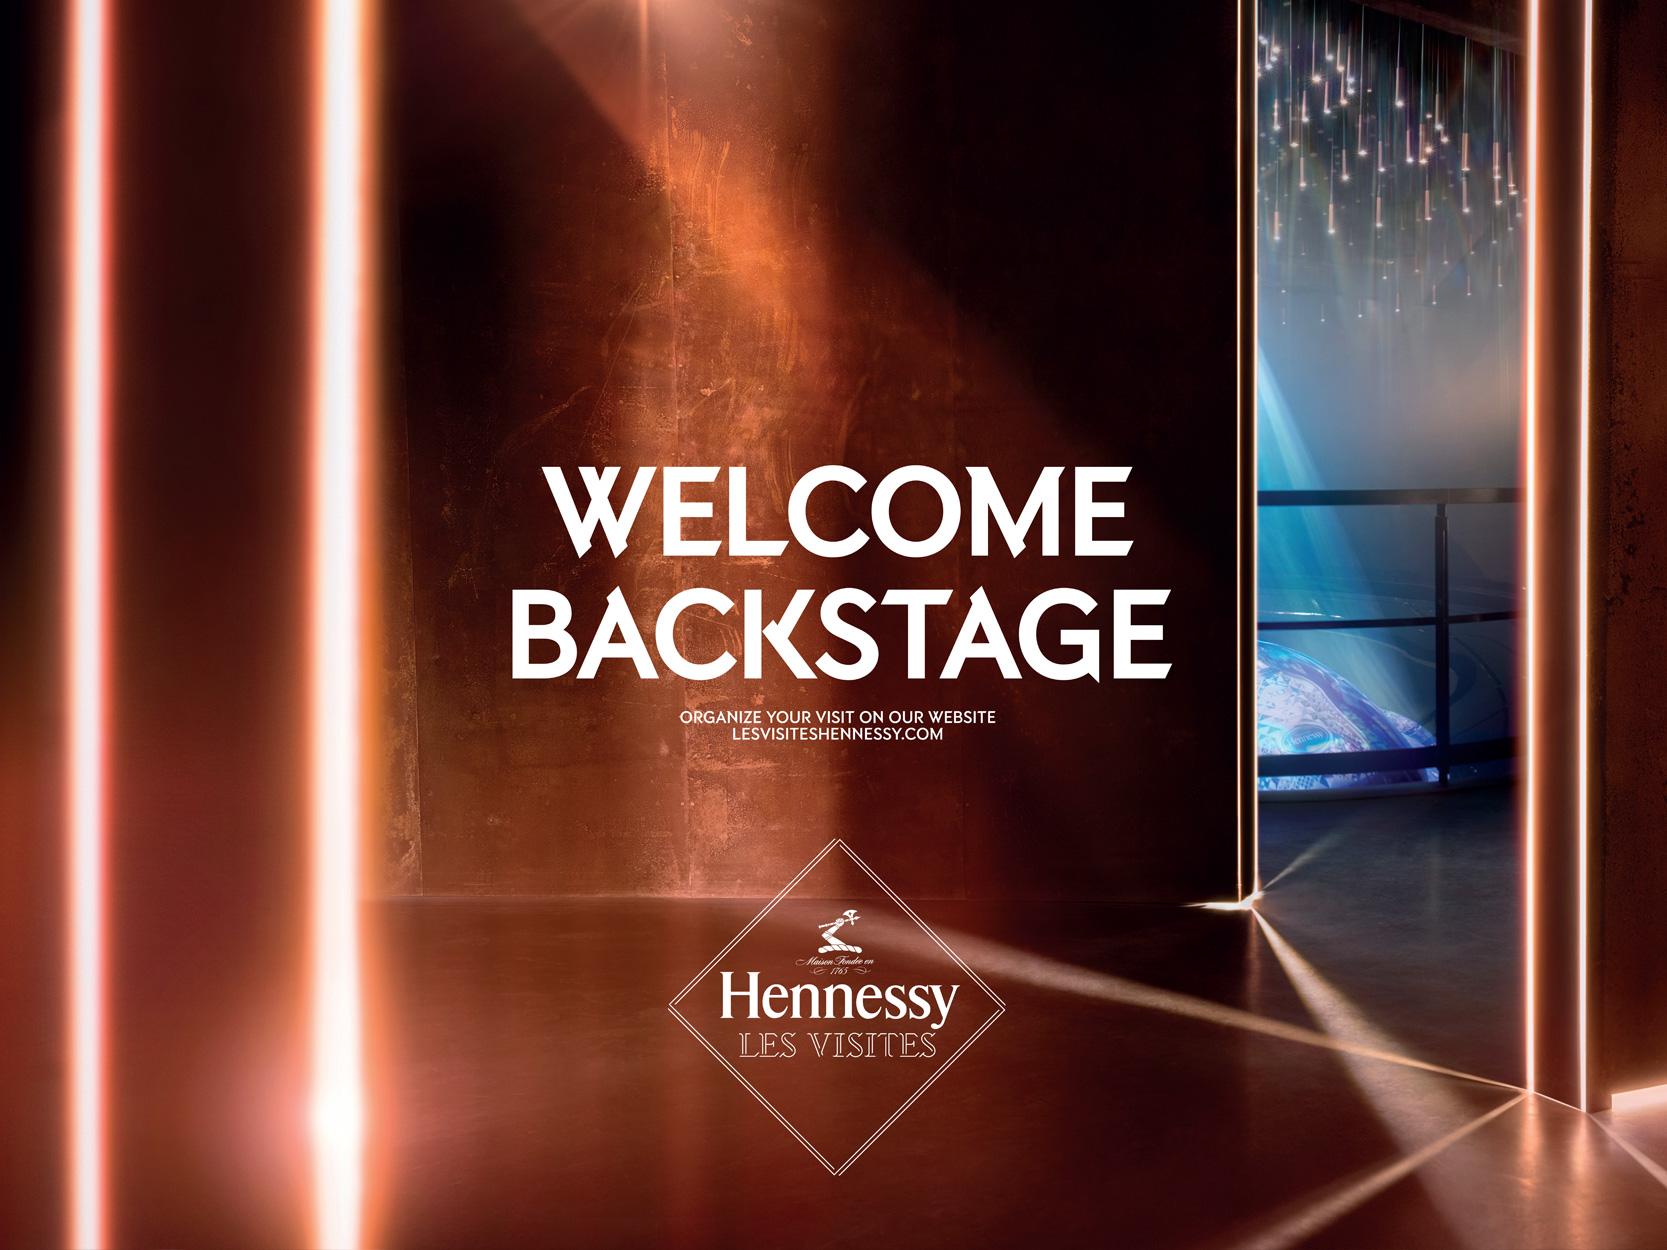 Hennessy Les Visites campaign